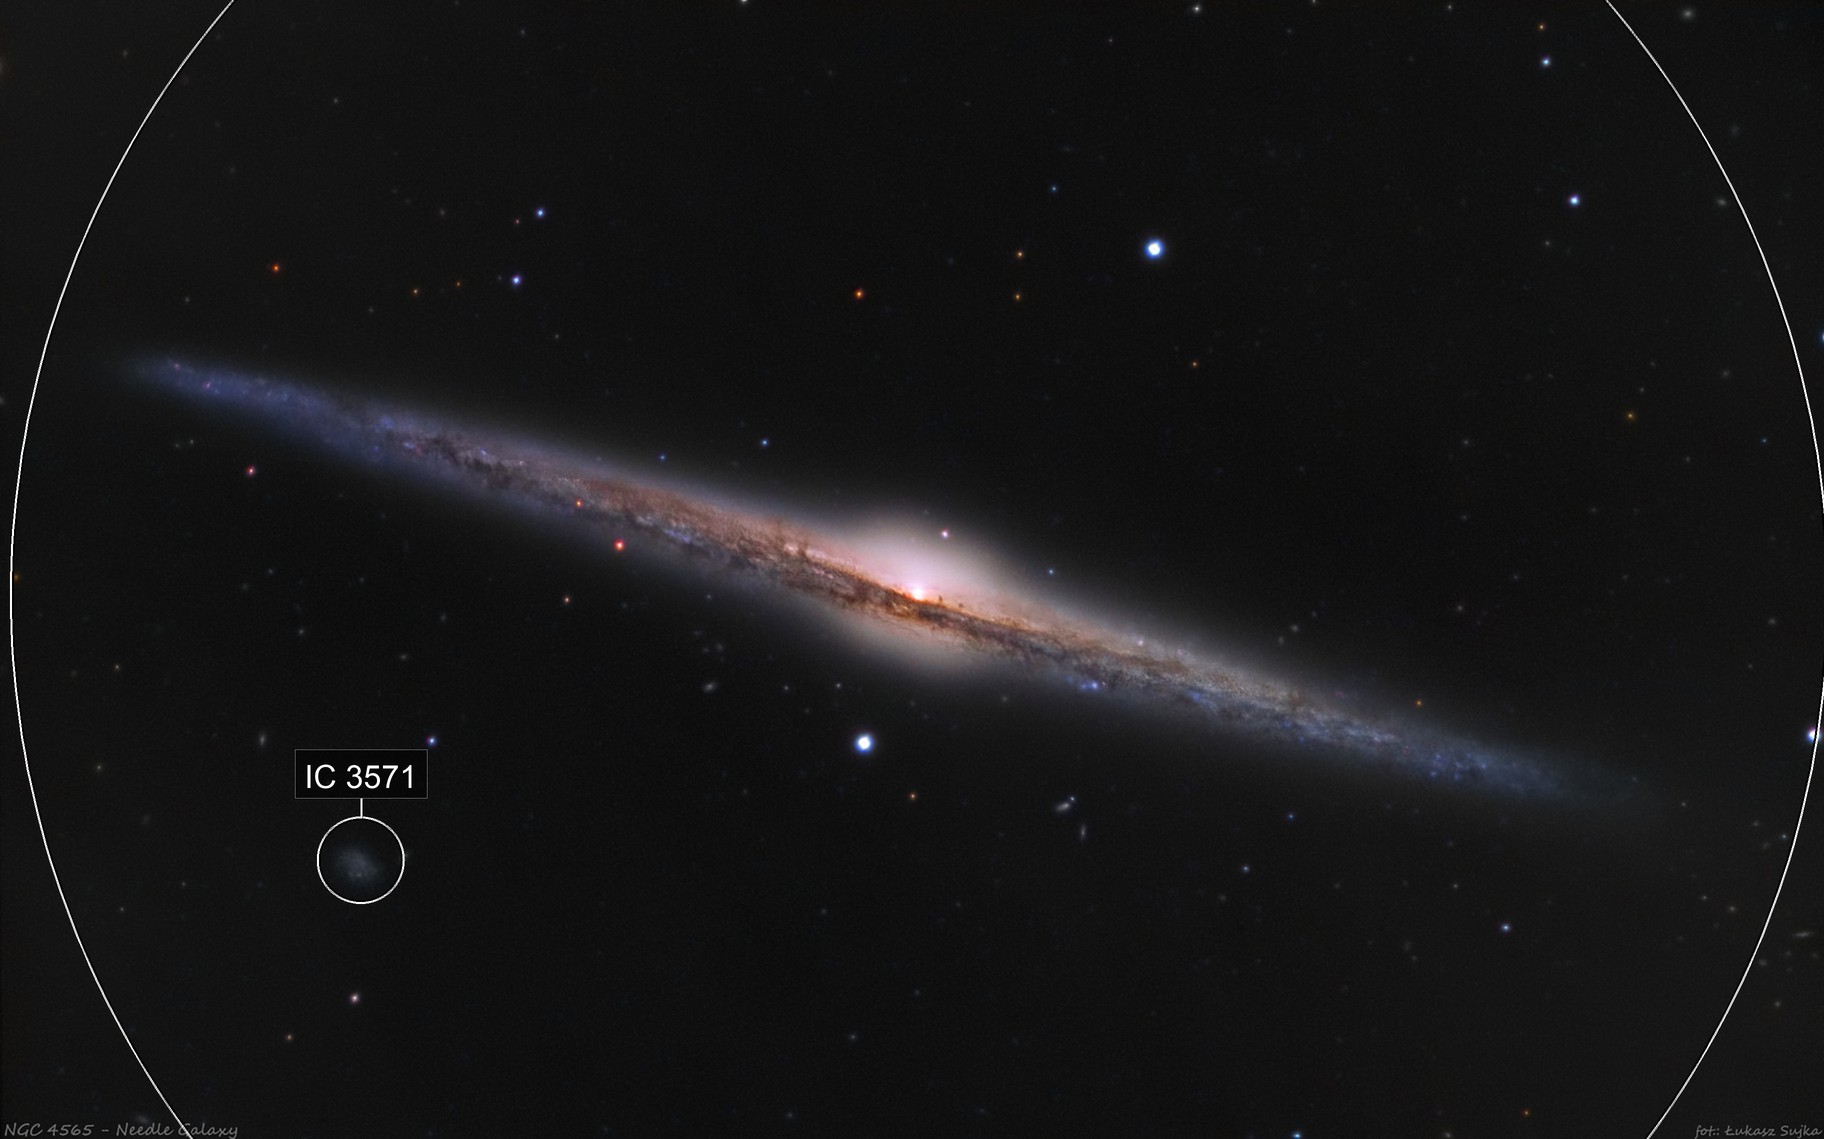 NGC 4565 - Needle Galaxy (in big scale)